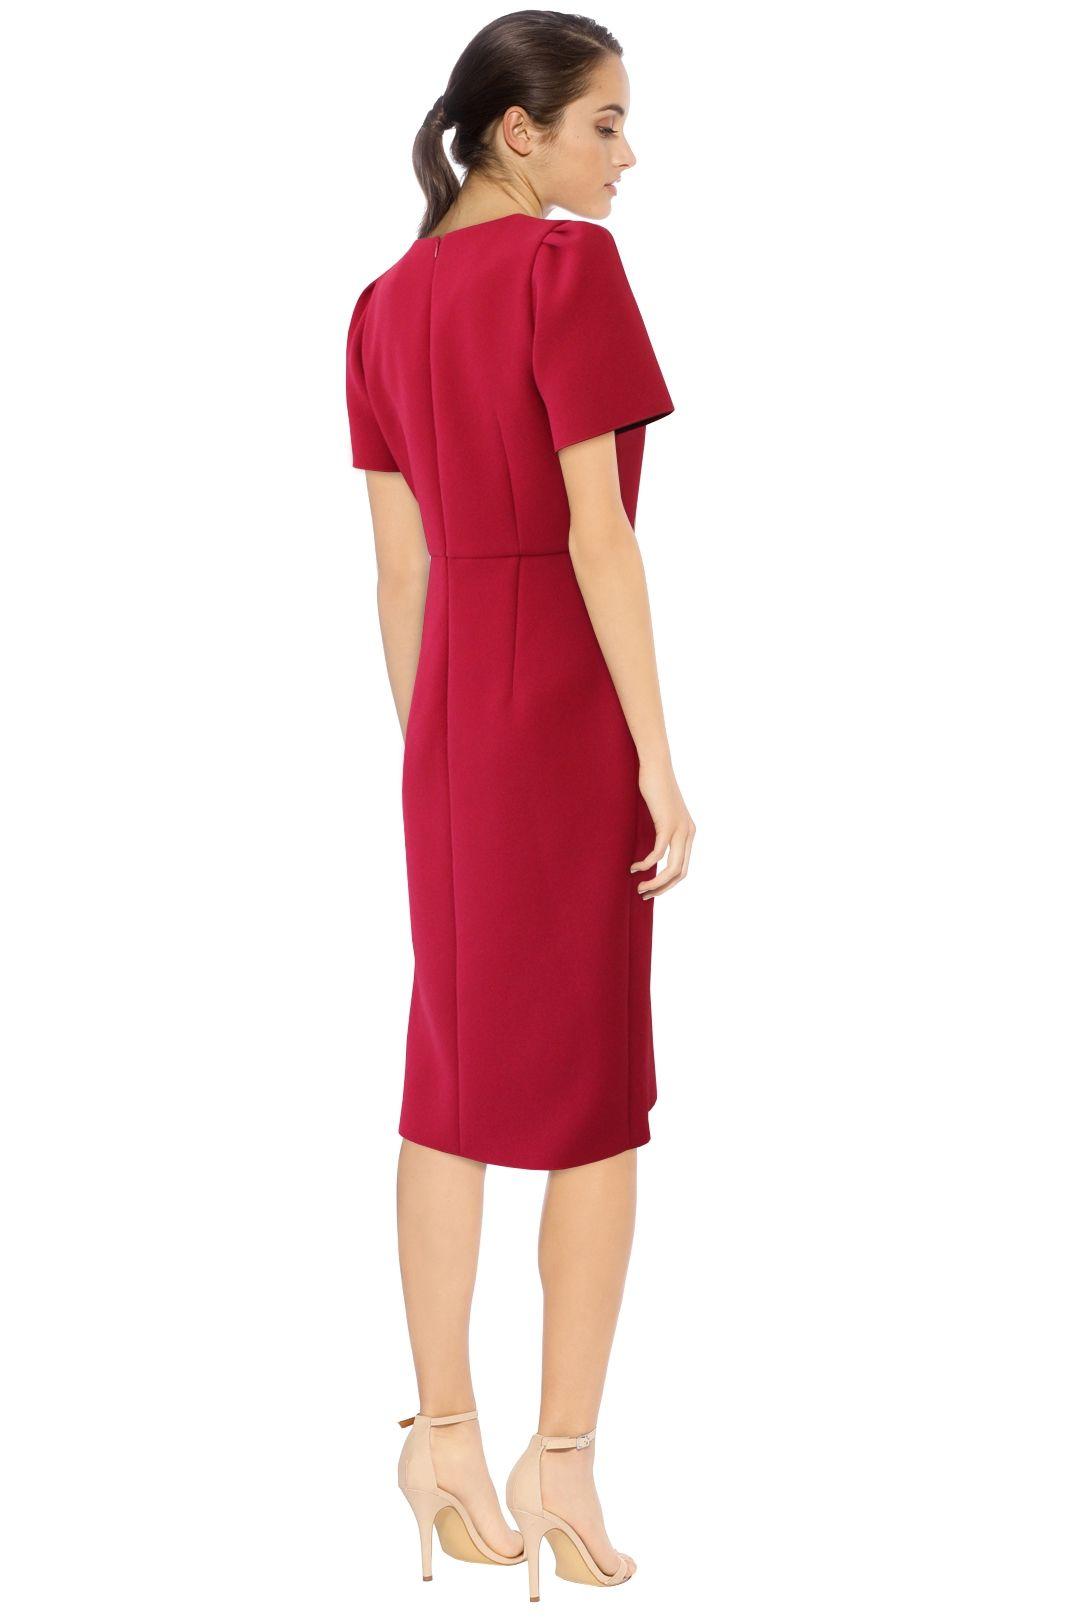 Yeojin Bae - Kristy Dress -Fushcia - Back